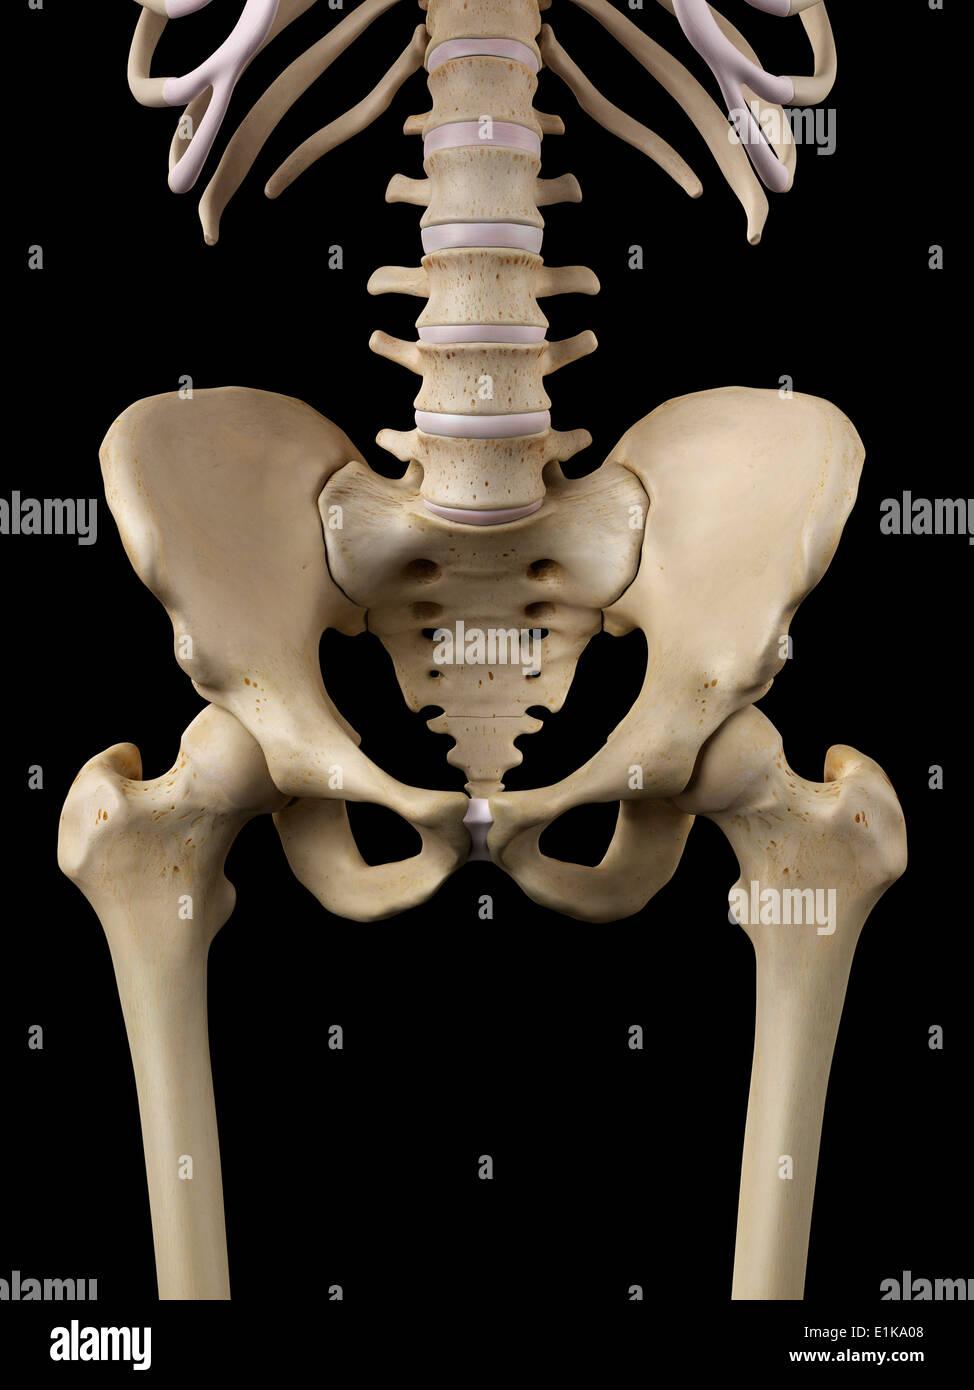 Human Hip Bones Computer Artwork Stock Photo 69881064 Alamy